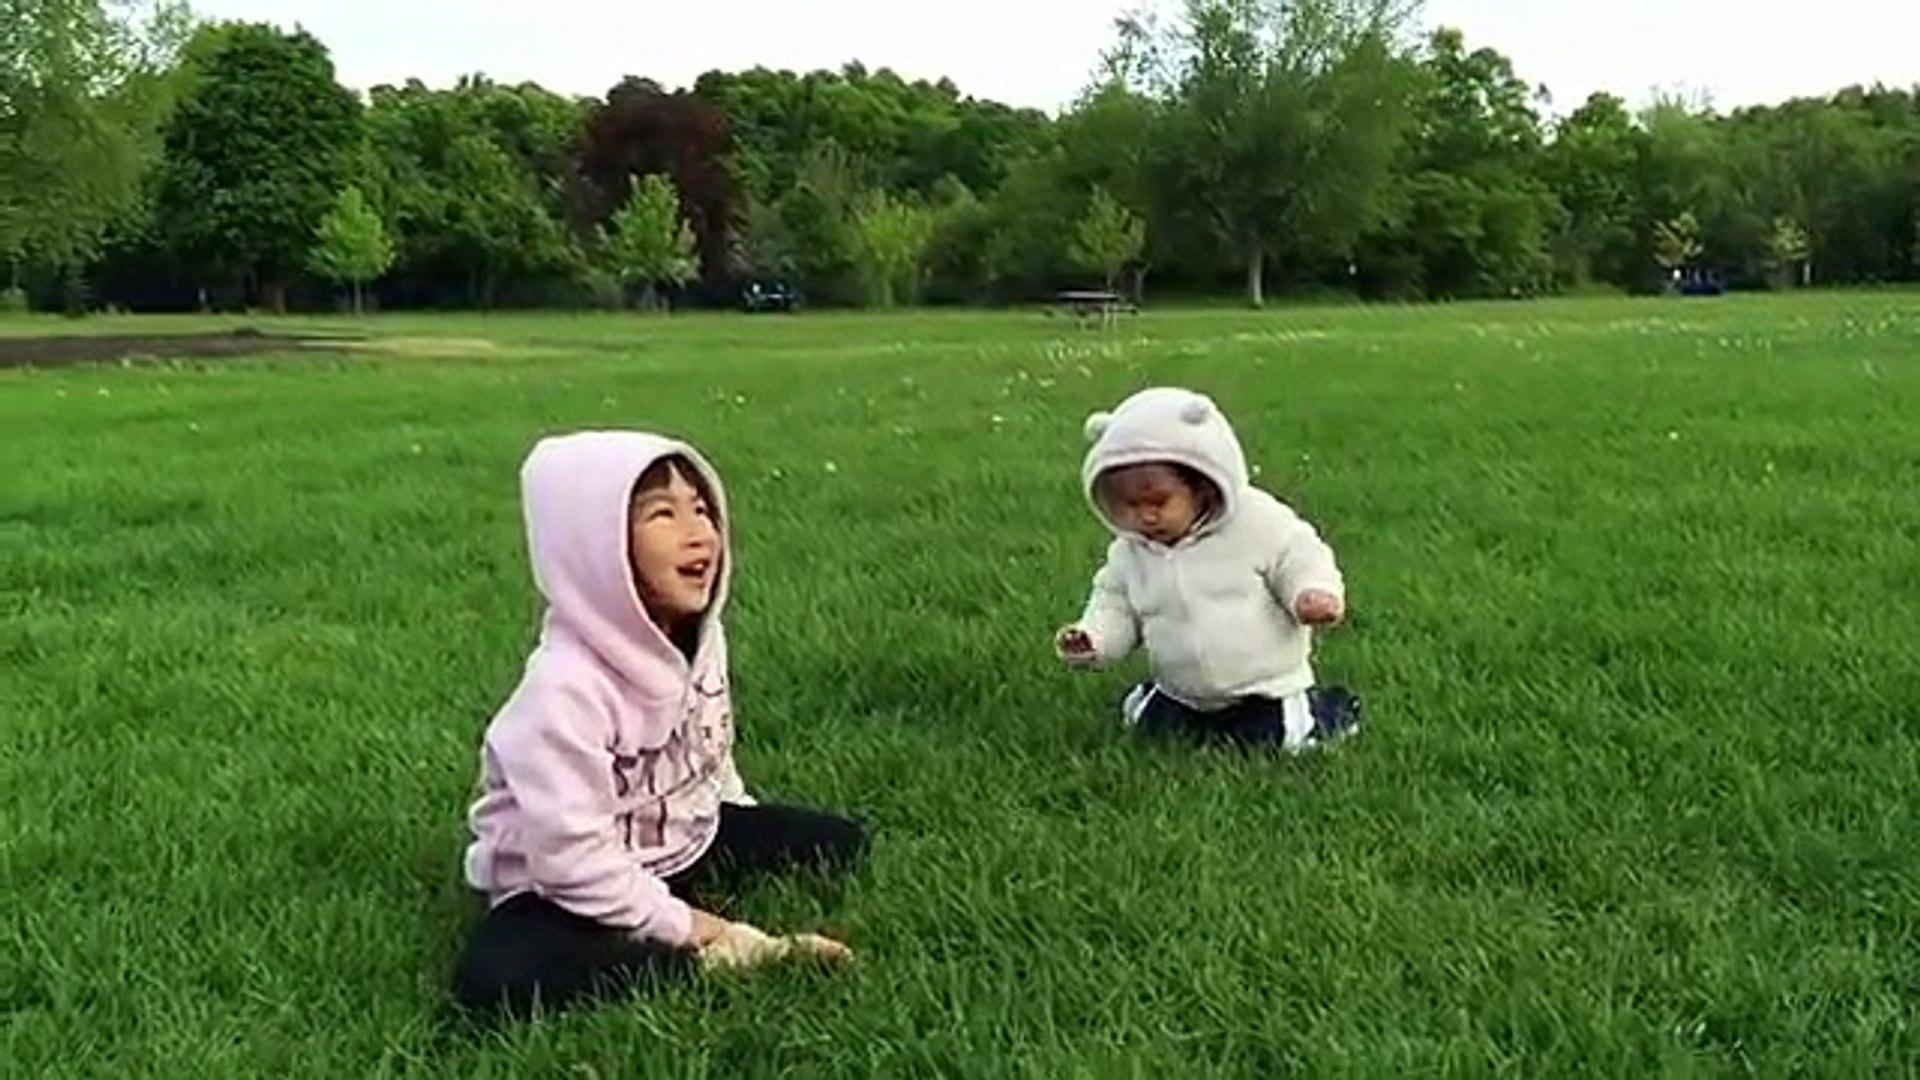 Funny baby videos - Cute baby videos - Funny Kids Videos